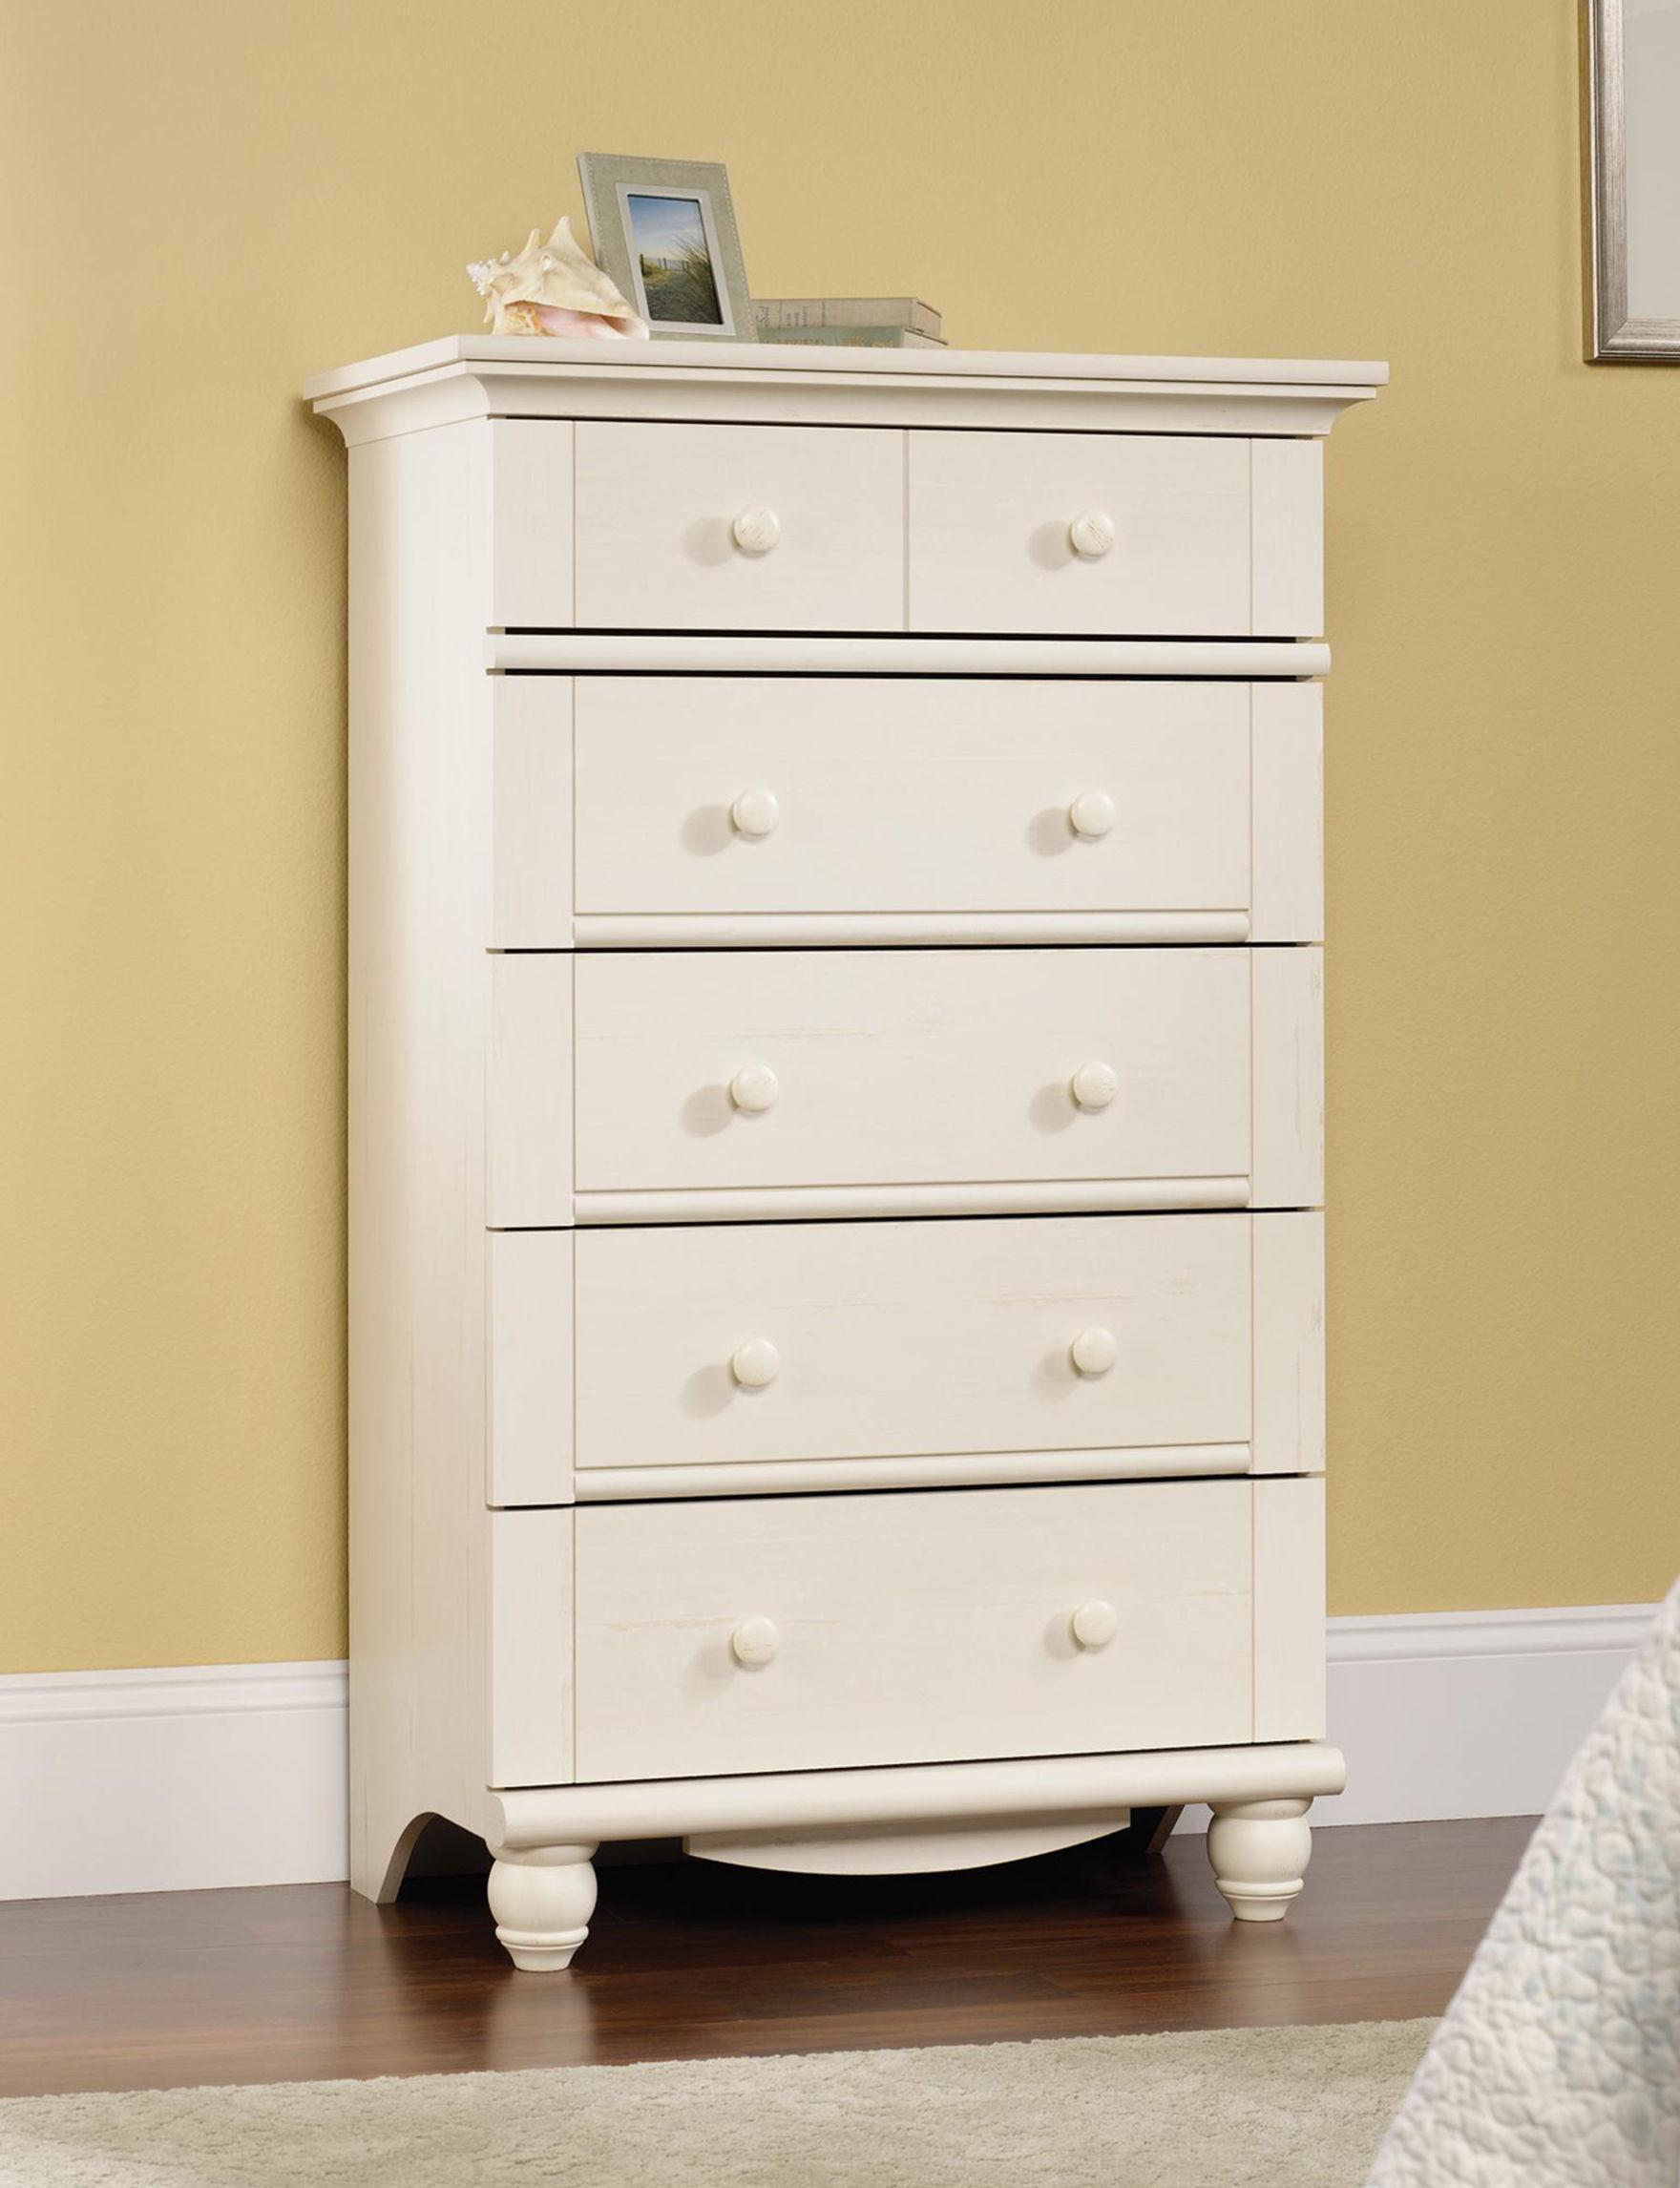 Sauder White Dressers & Chests Bedroom Furniture